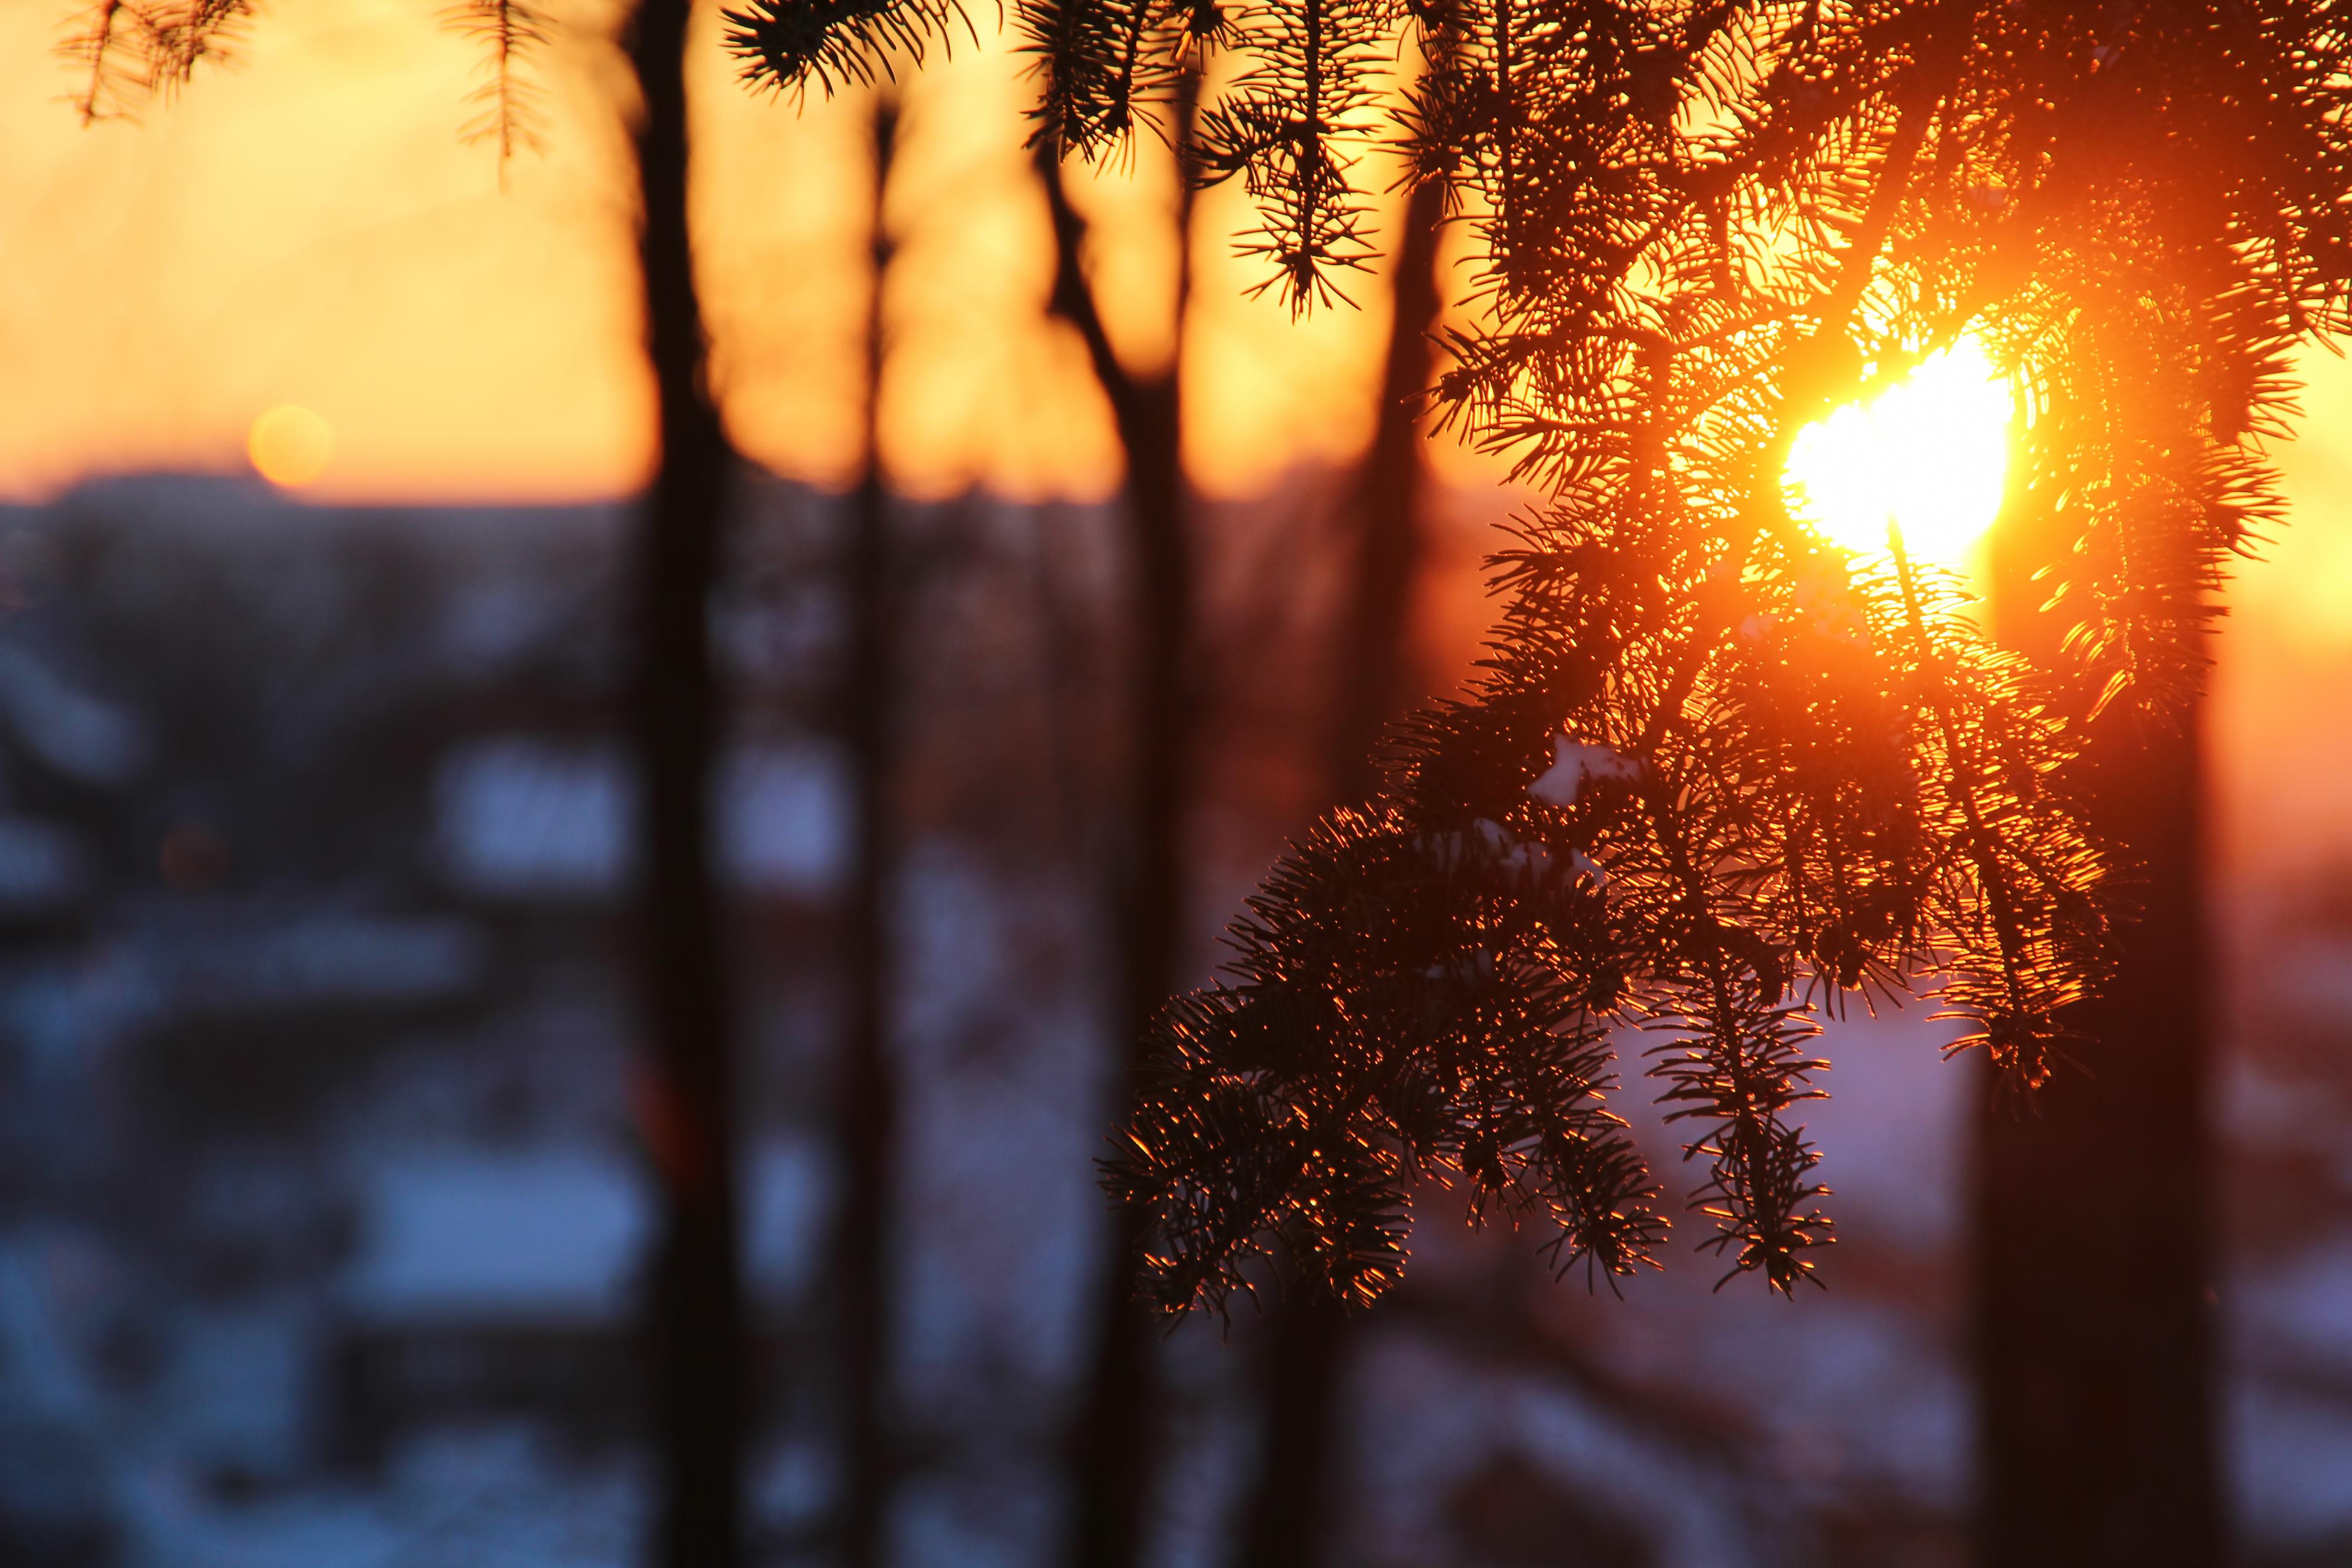 Tree branch in sunshine photo